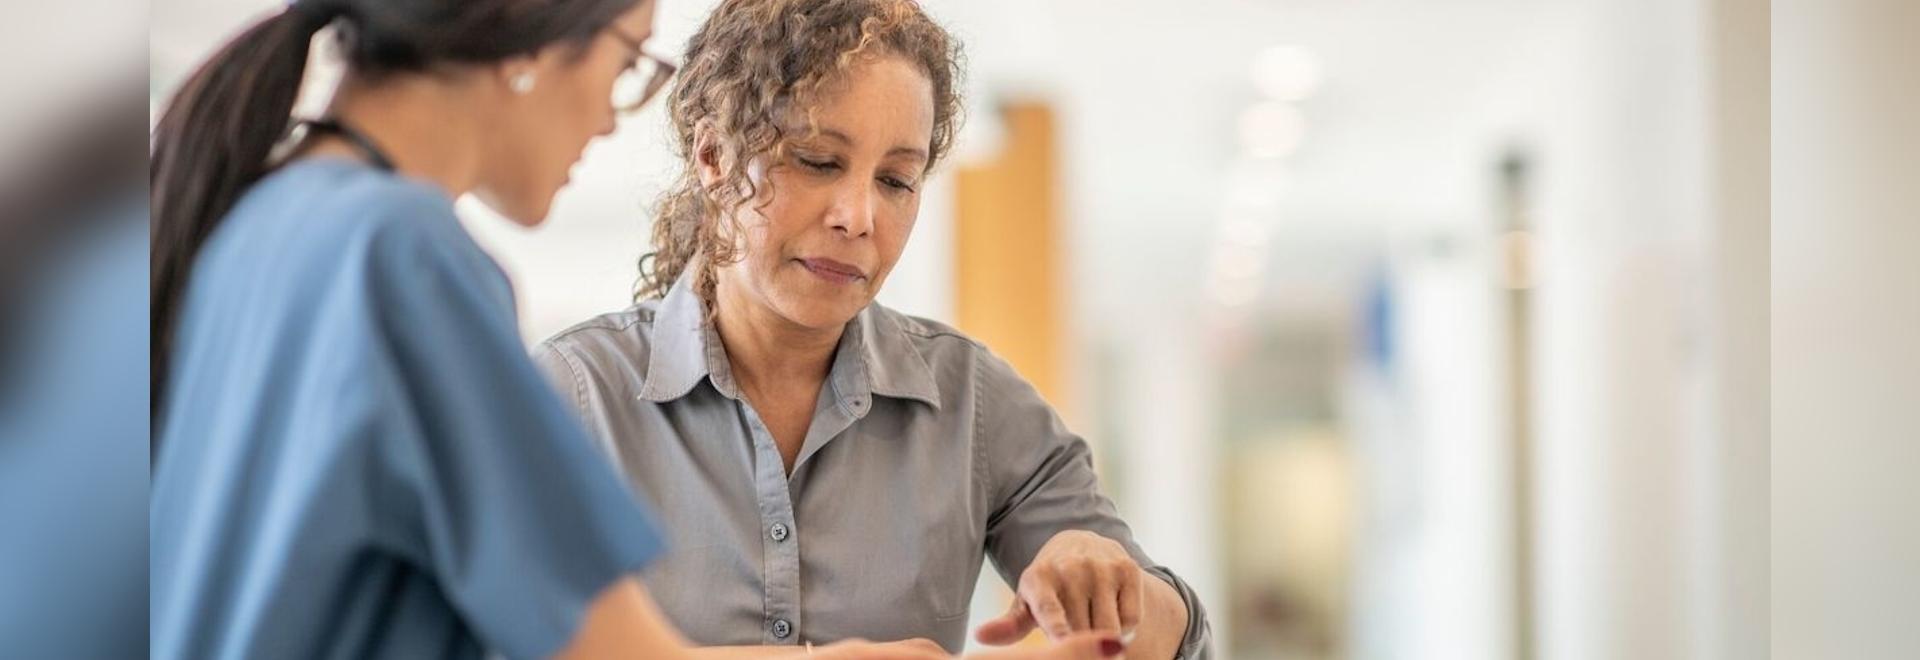 Contribución: Telemedicina para todas sus necesidades de salud femenina